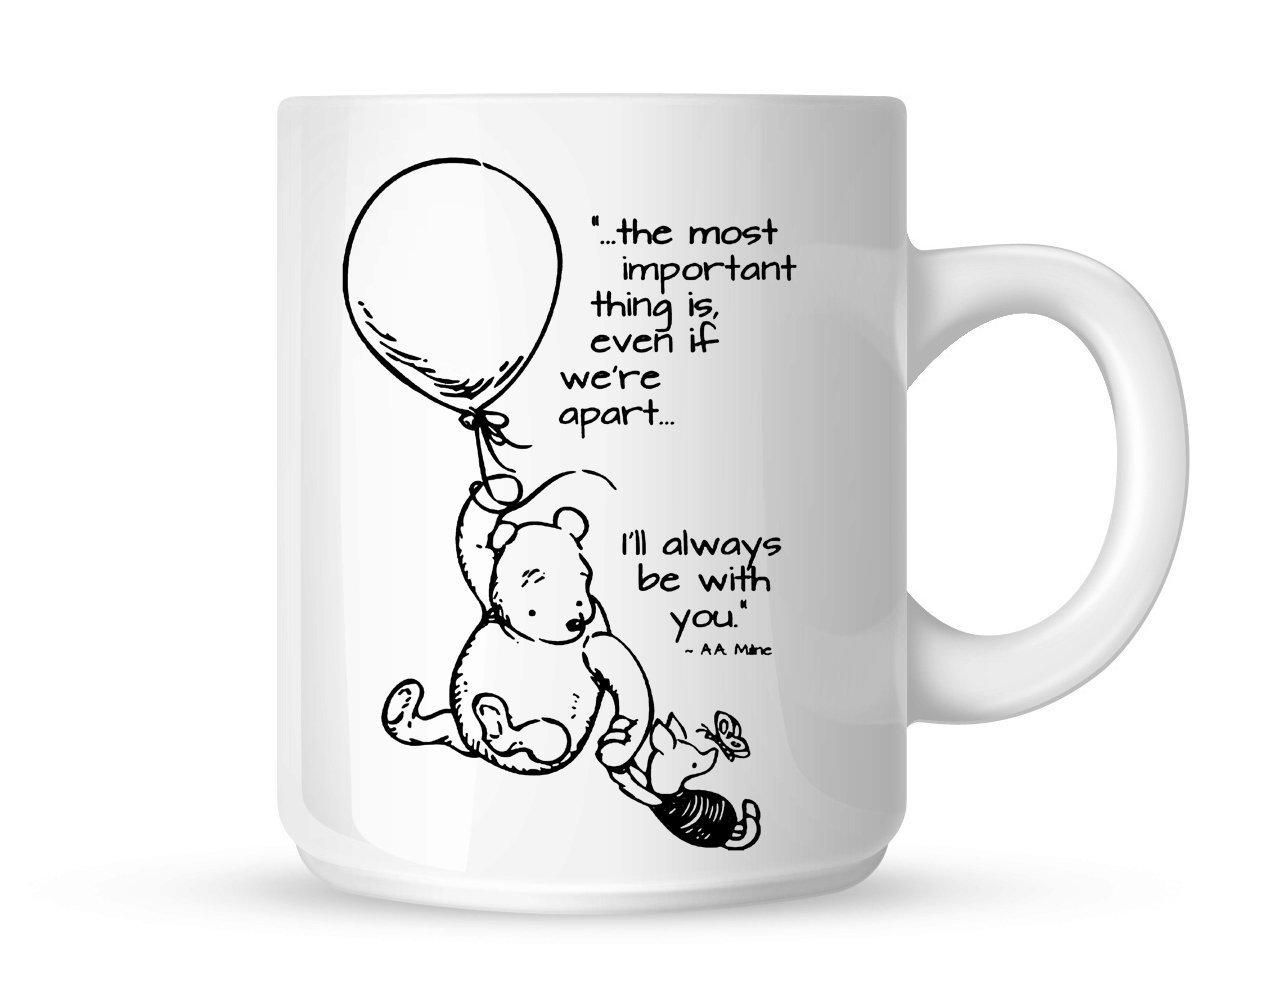 bd01883a841 Amazon.com: Winnie the Pooh Love Quotes Mug White Mug 11oz: Kitchen & Dining